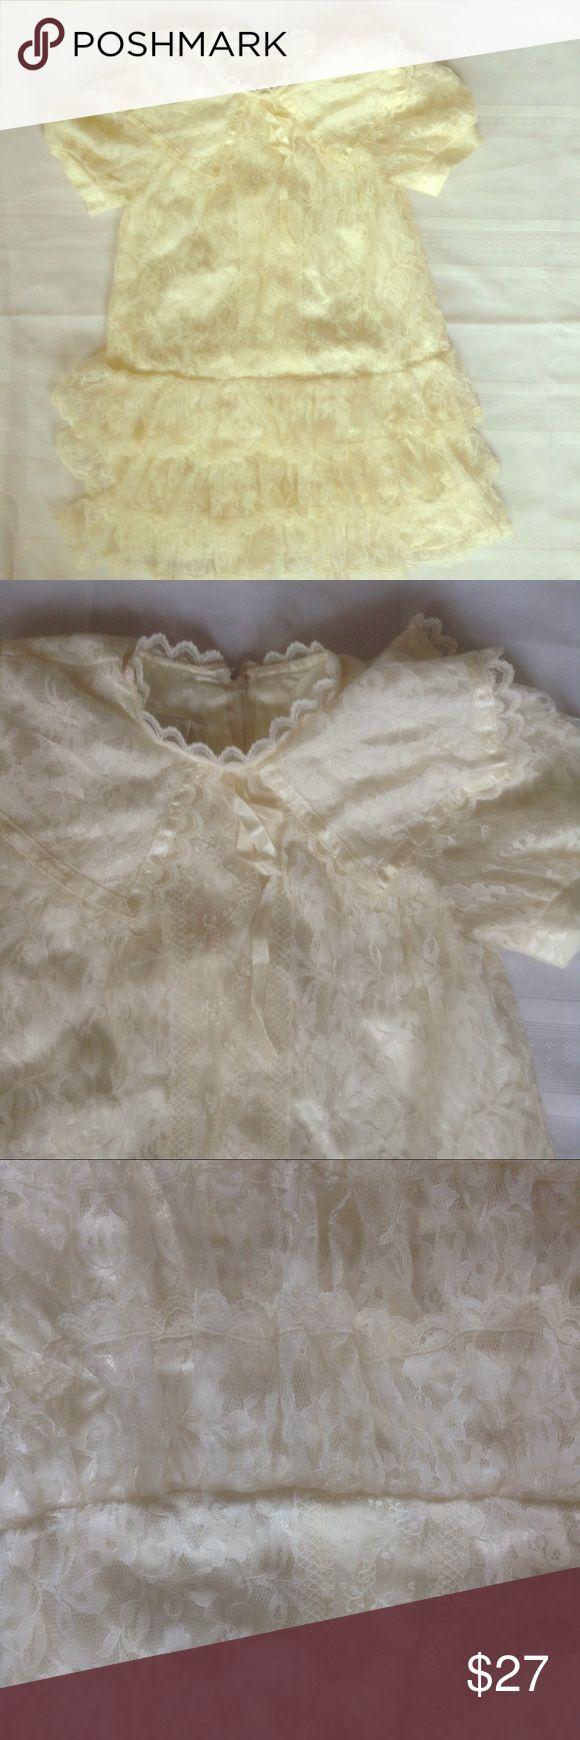 Vintage Gunne Sax lace girls dress 4 Beautiful vintage dress in very good Vtg condition. Lace ruffle Big collar . Prairie Victorian.armpit to armpit 15 length 23. By Jessica McClintock gunne sax Dresses Formal